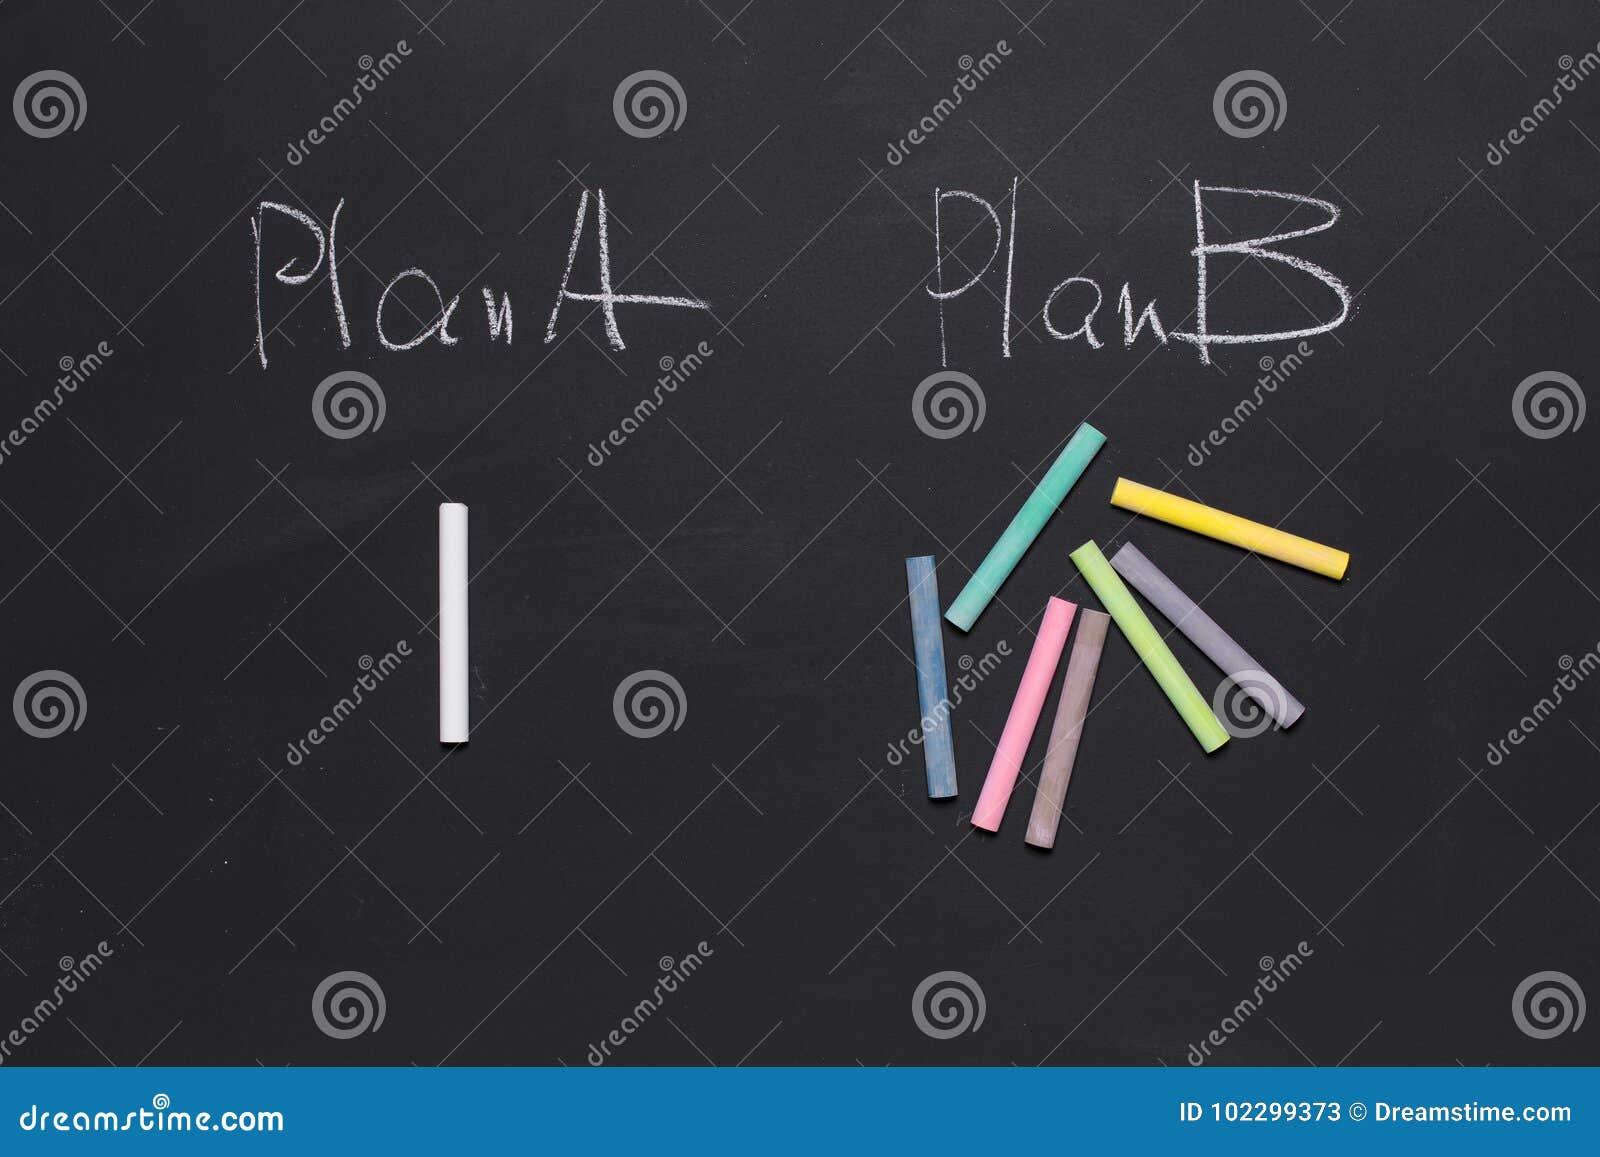 Plan A of B